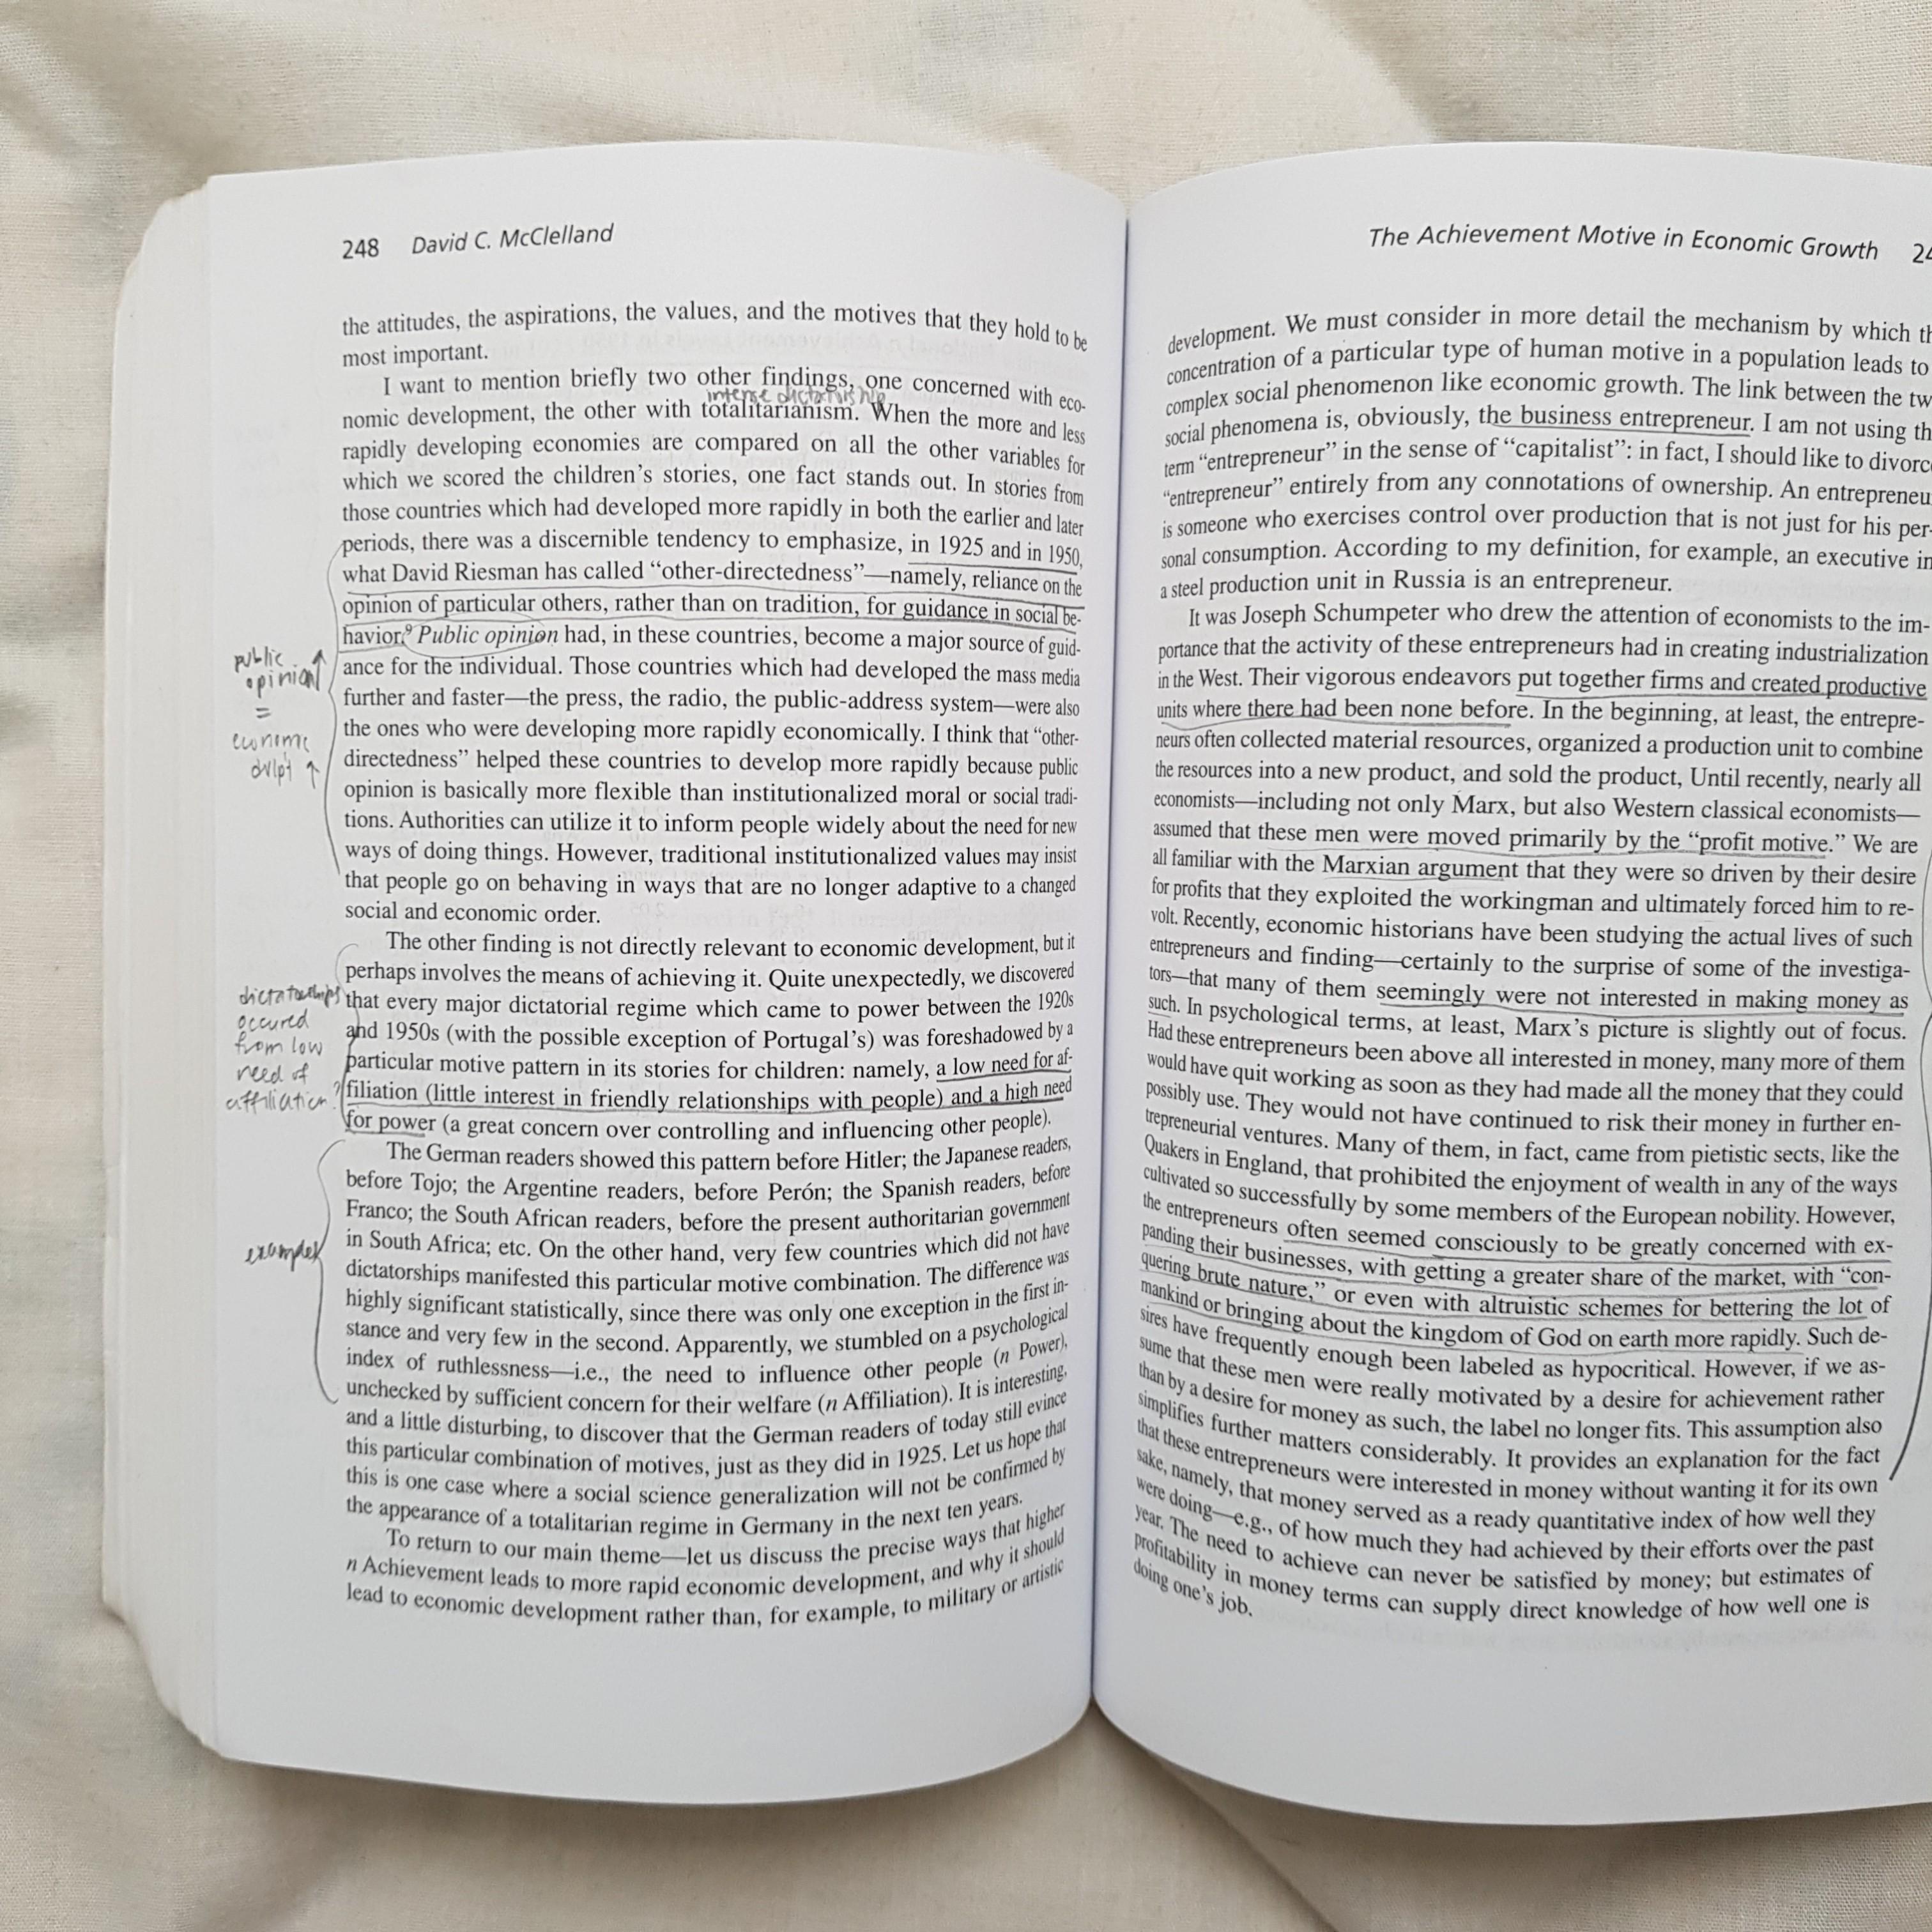 SOSC 2800 BOOKS